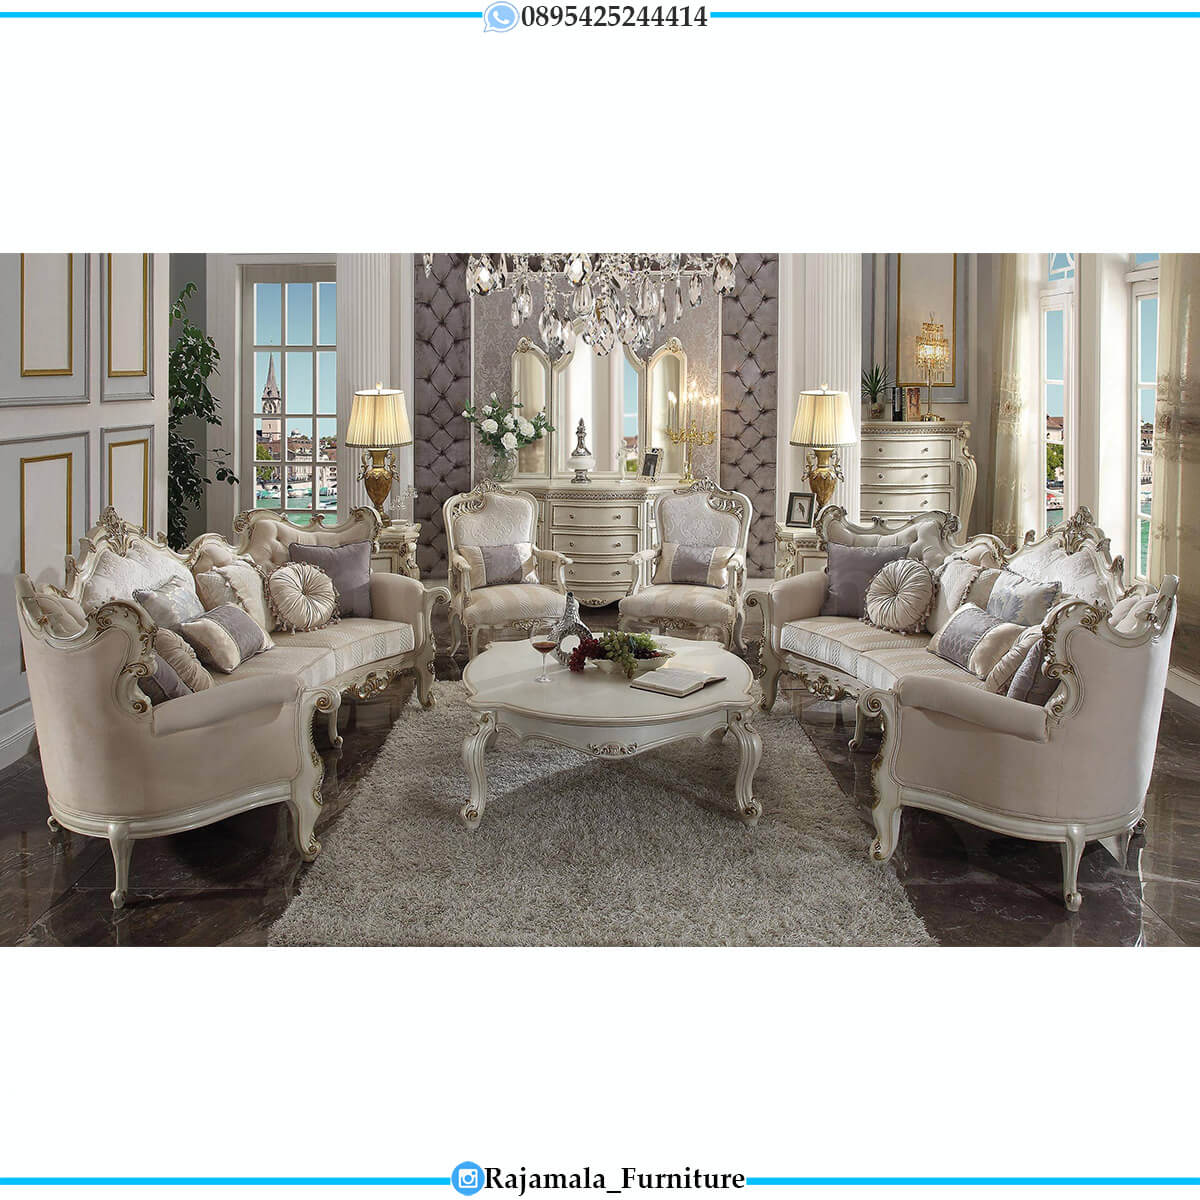 Sofa Tamu Mewah Jepara Elegant Design Luxury Carving Style RM-0610